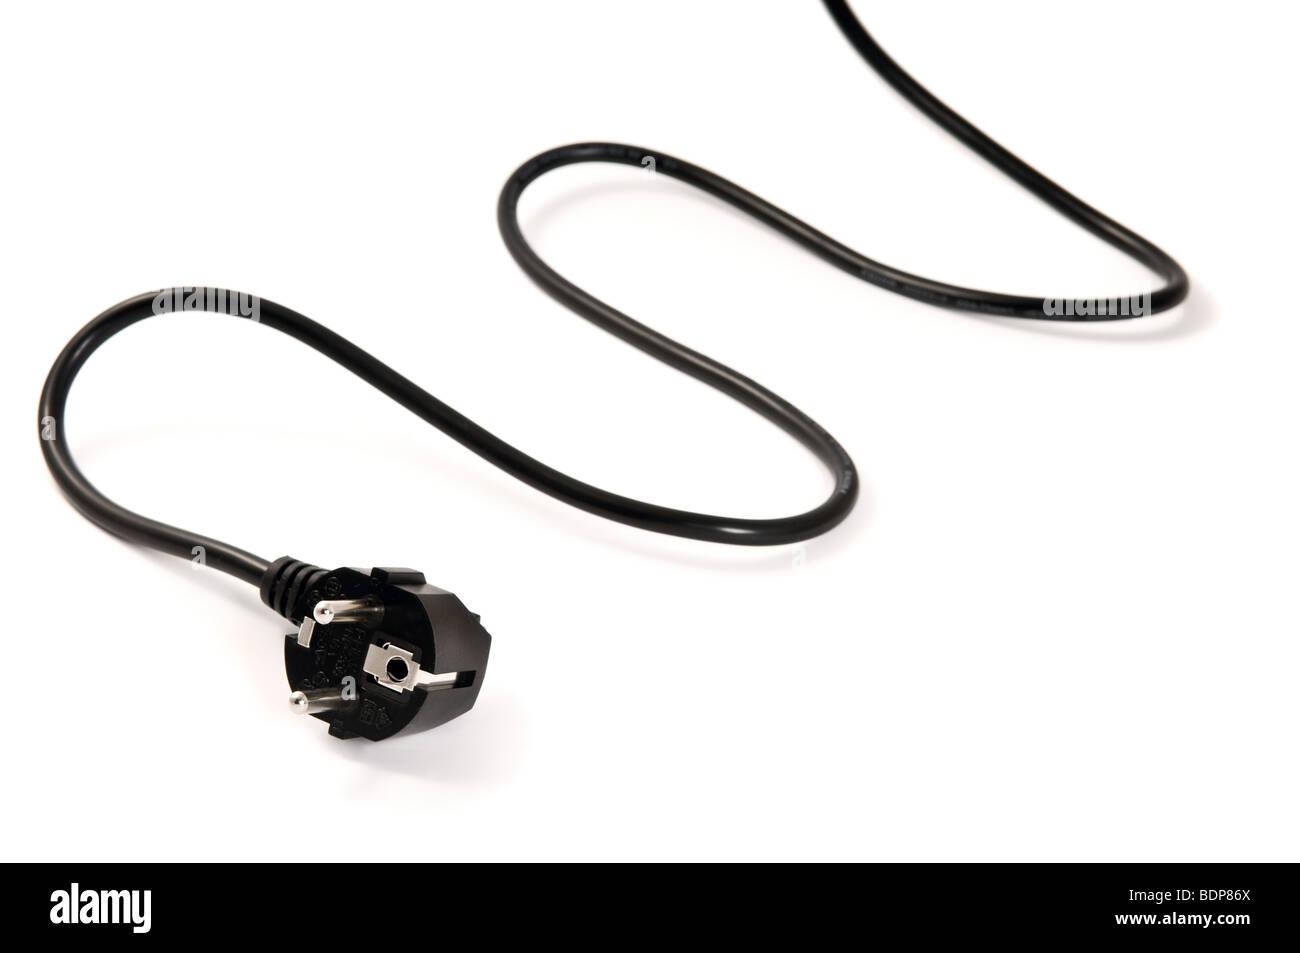 elektrische Stecker - Nahaufnahme Blick Netzkabel Stockbild